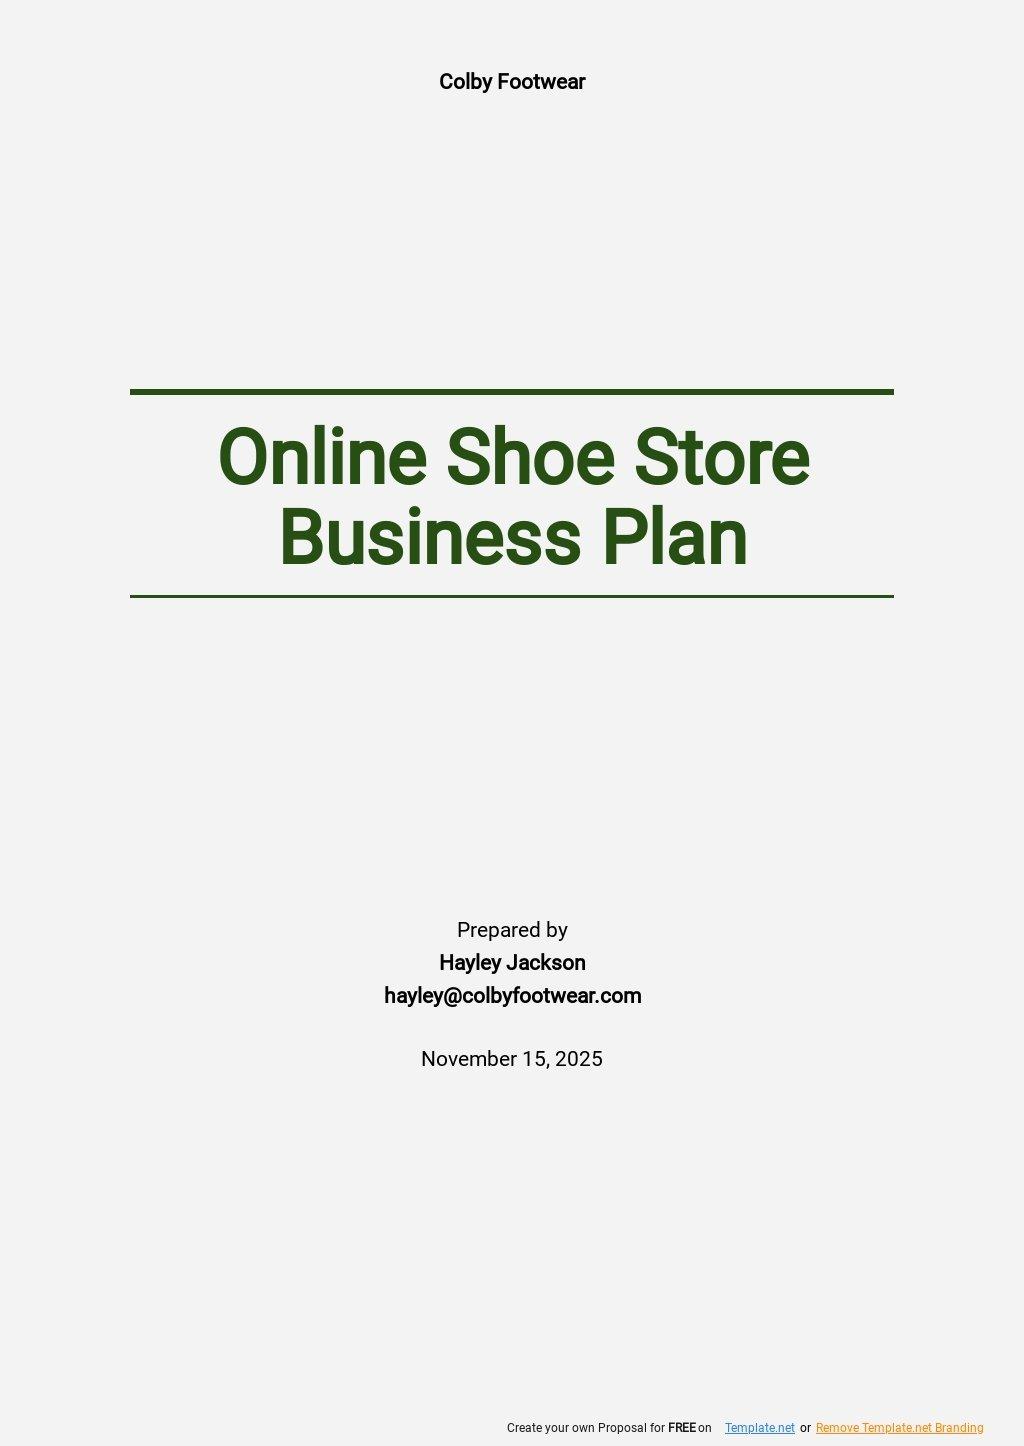 Online Shoe Store Business Plan Template.jpe